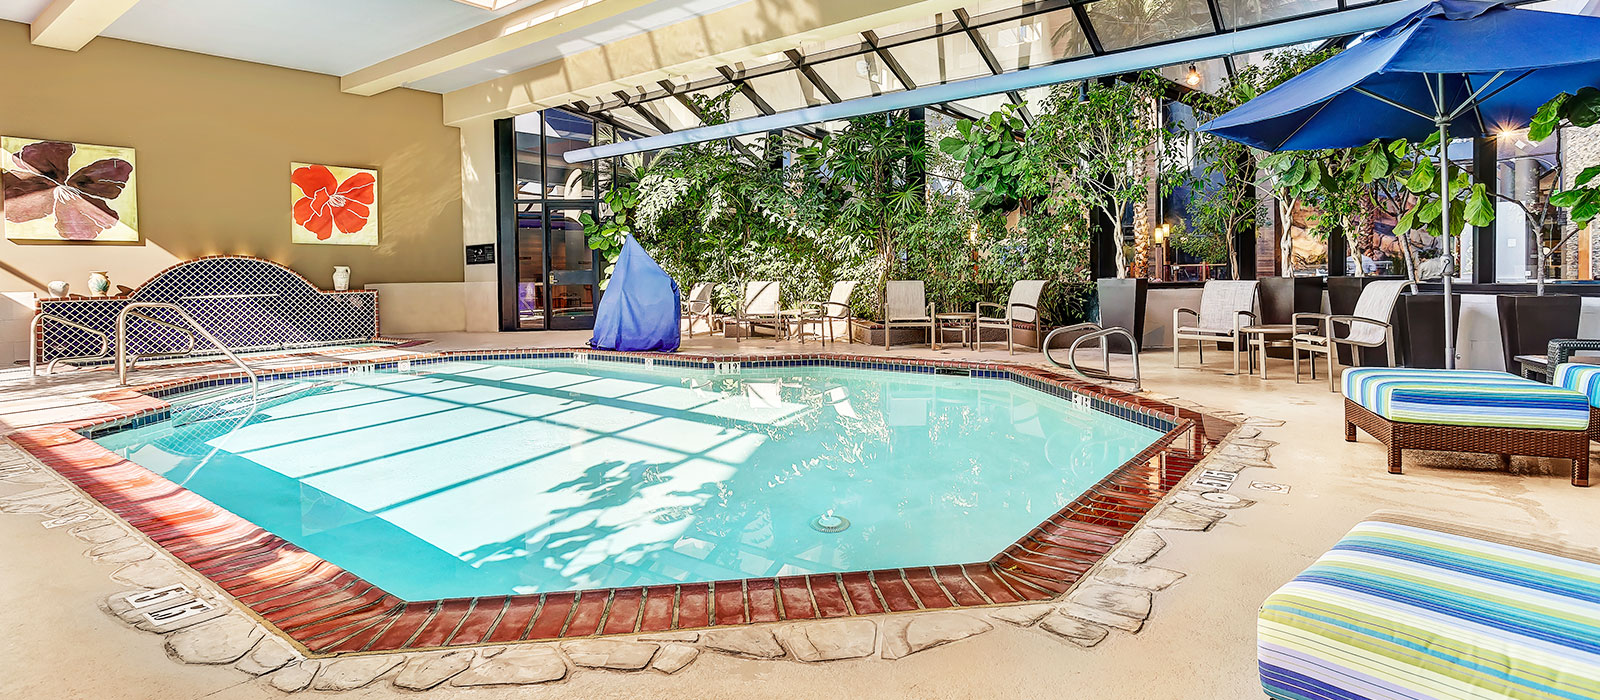 Crowne Plaza - Foster City Hotel, California